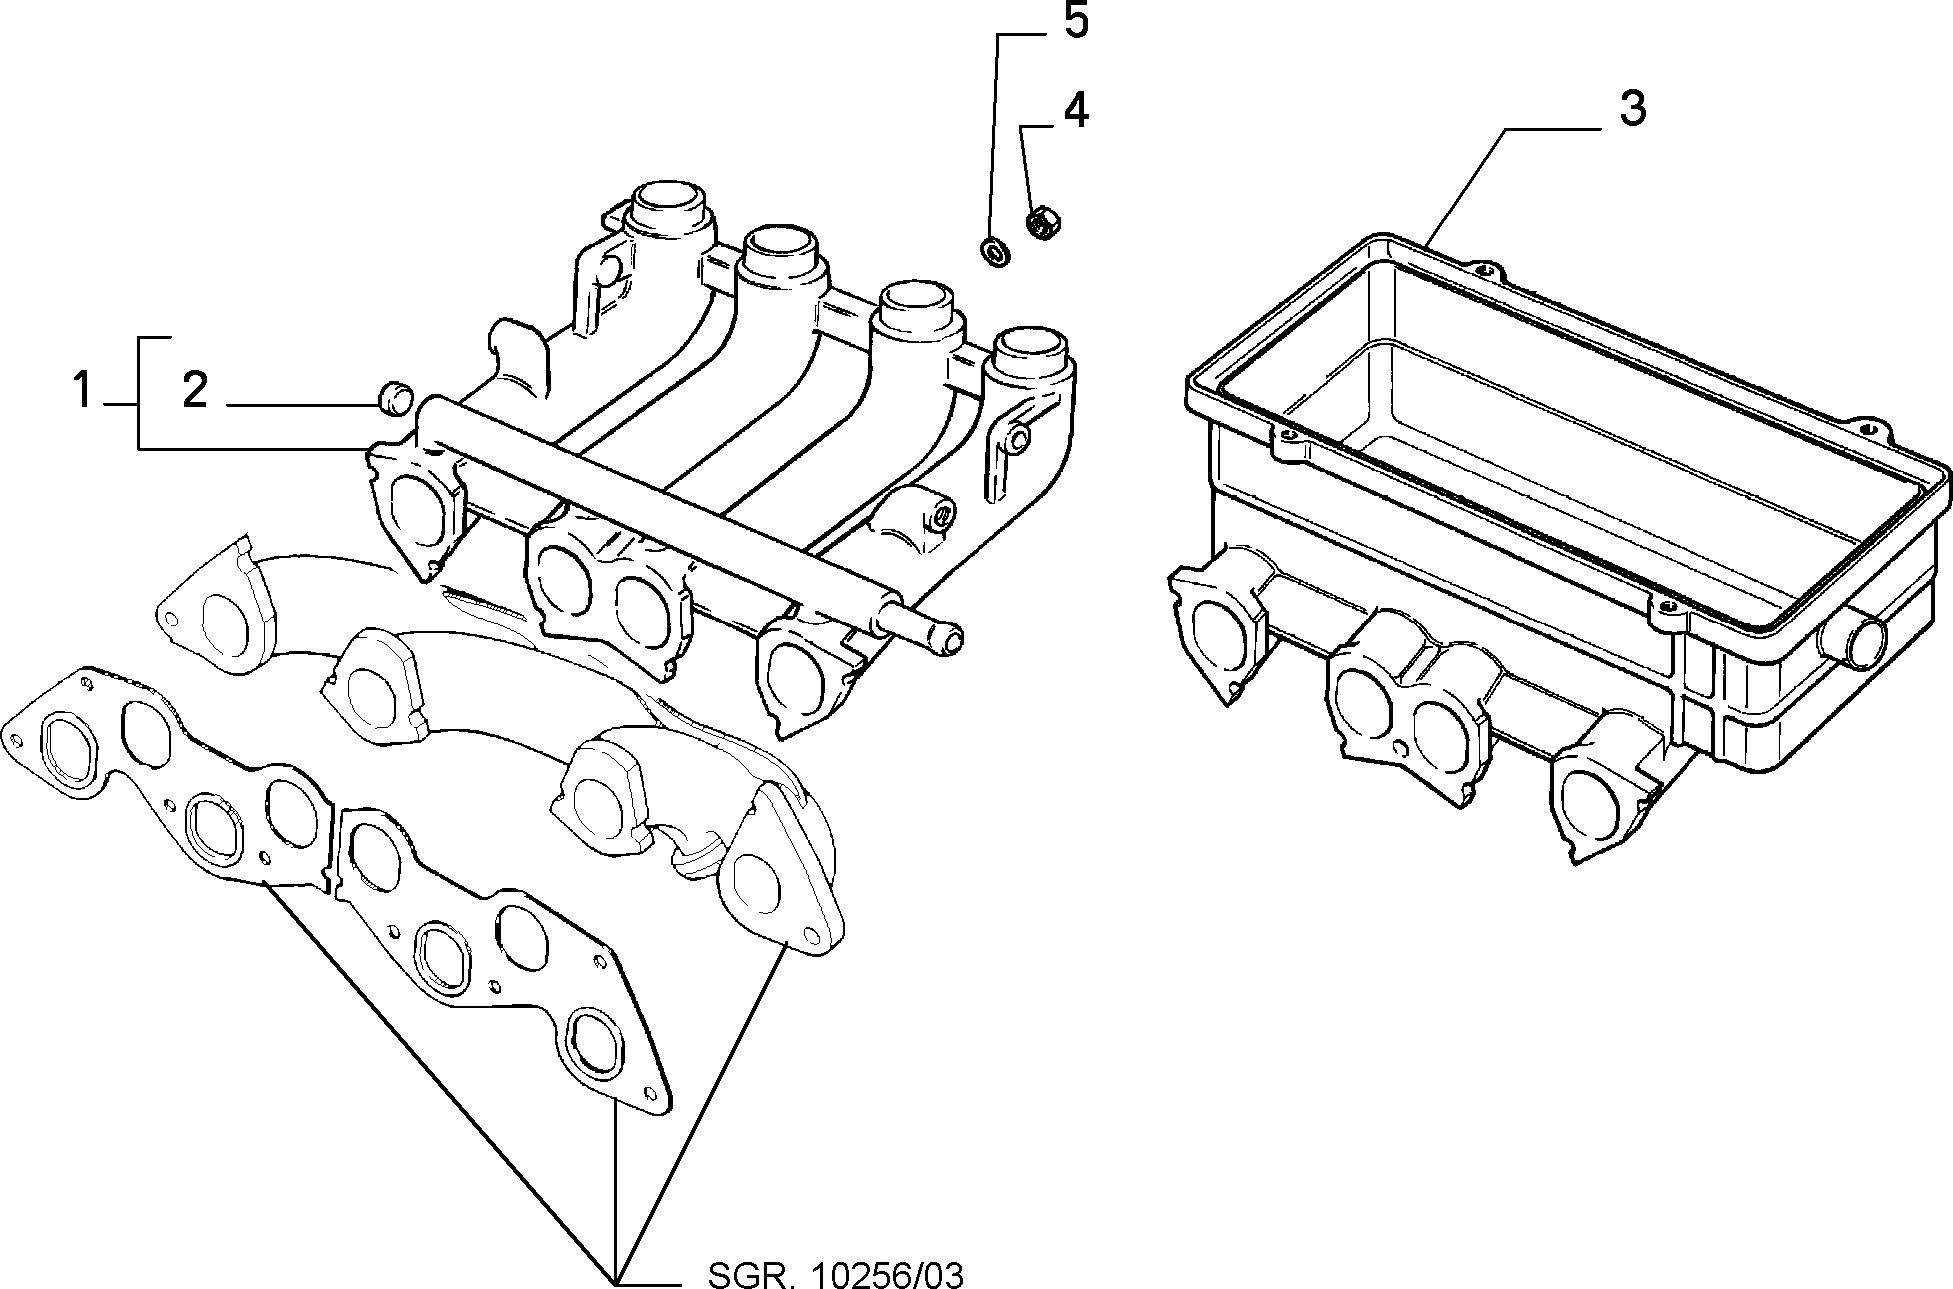 10255/03 ВСАСЫВАЮЩИЙ КАНАЛ